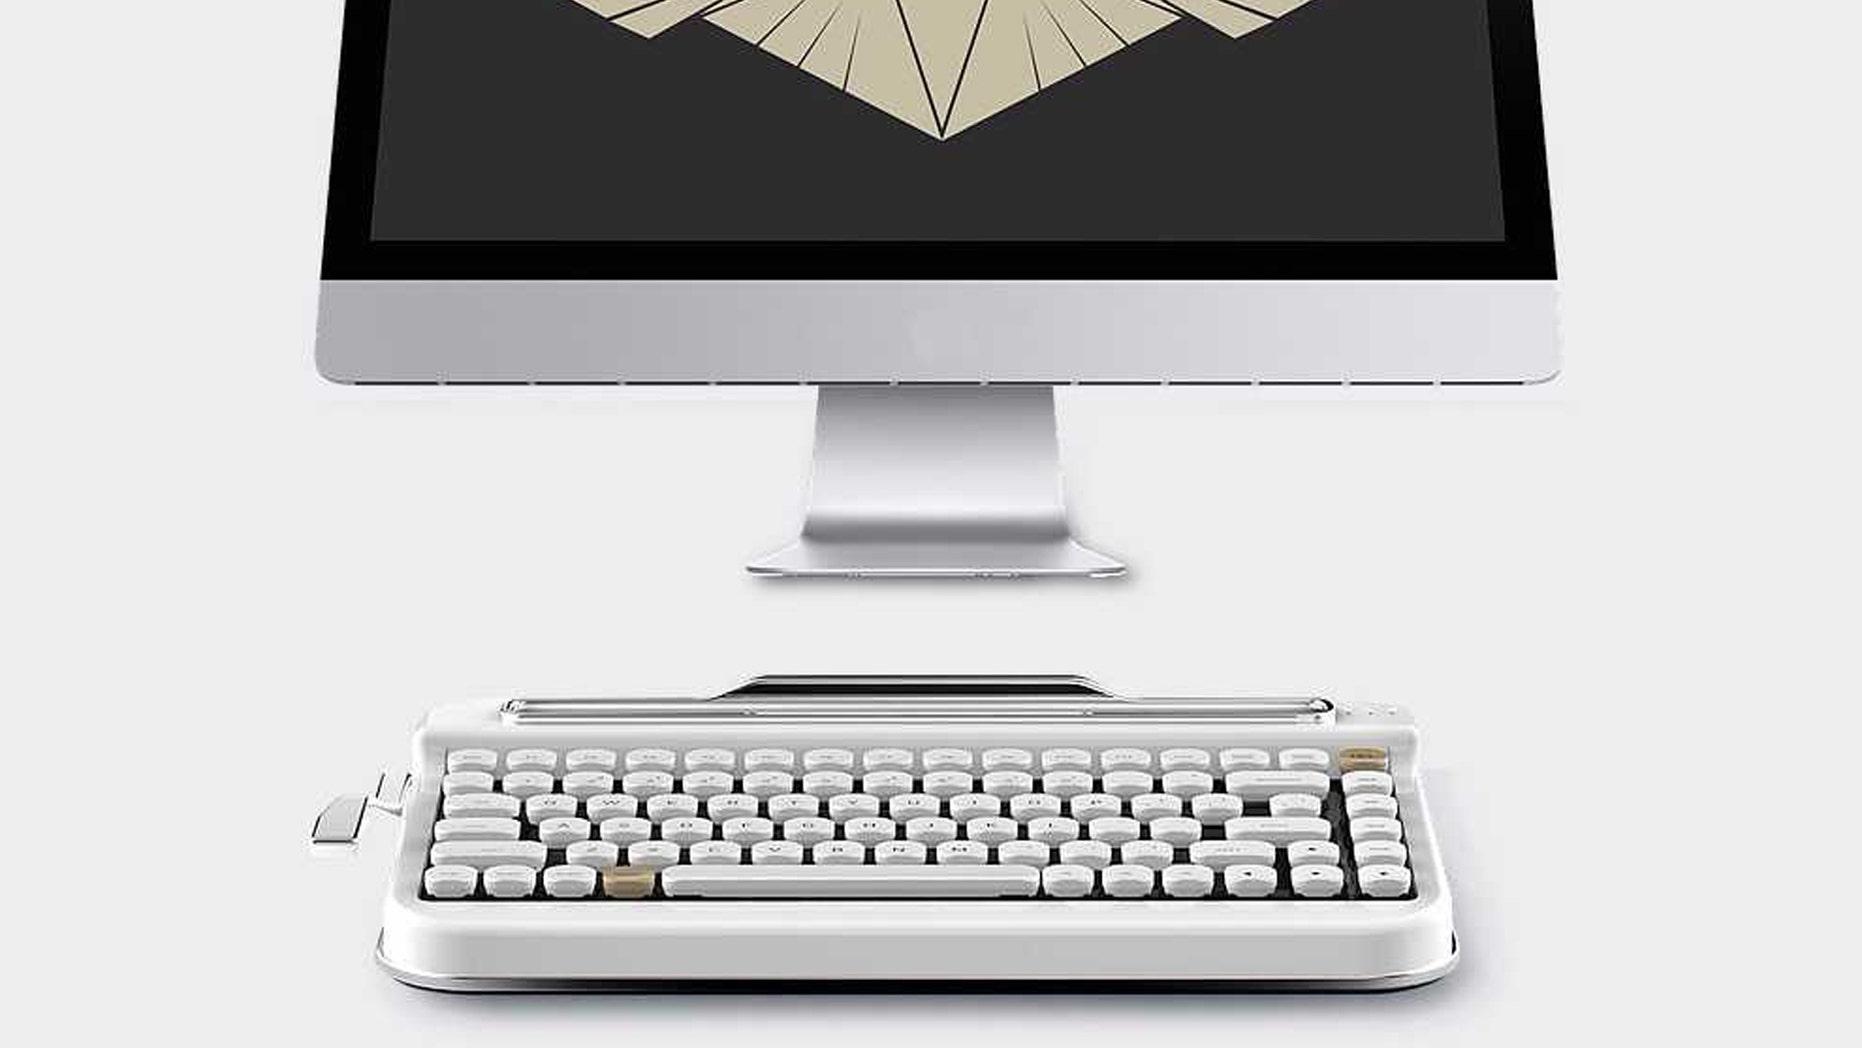 c9f0dcd9ded Retro typewriter keyboard is the MacBook antidote | Fox News